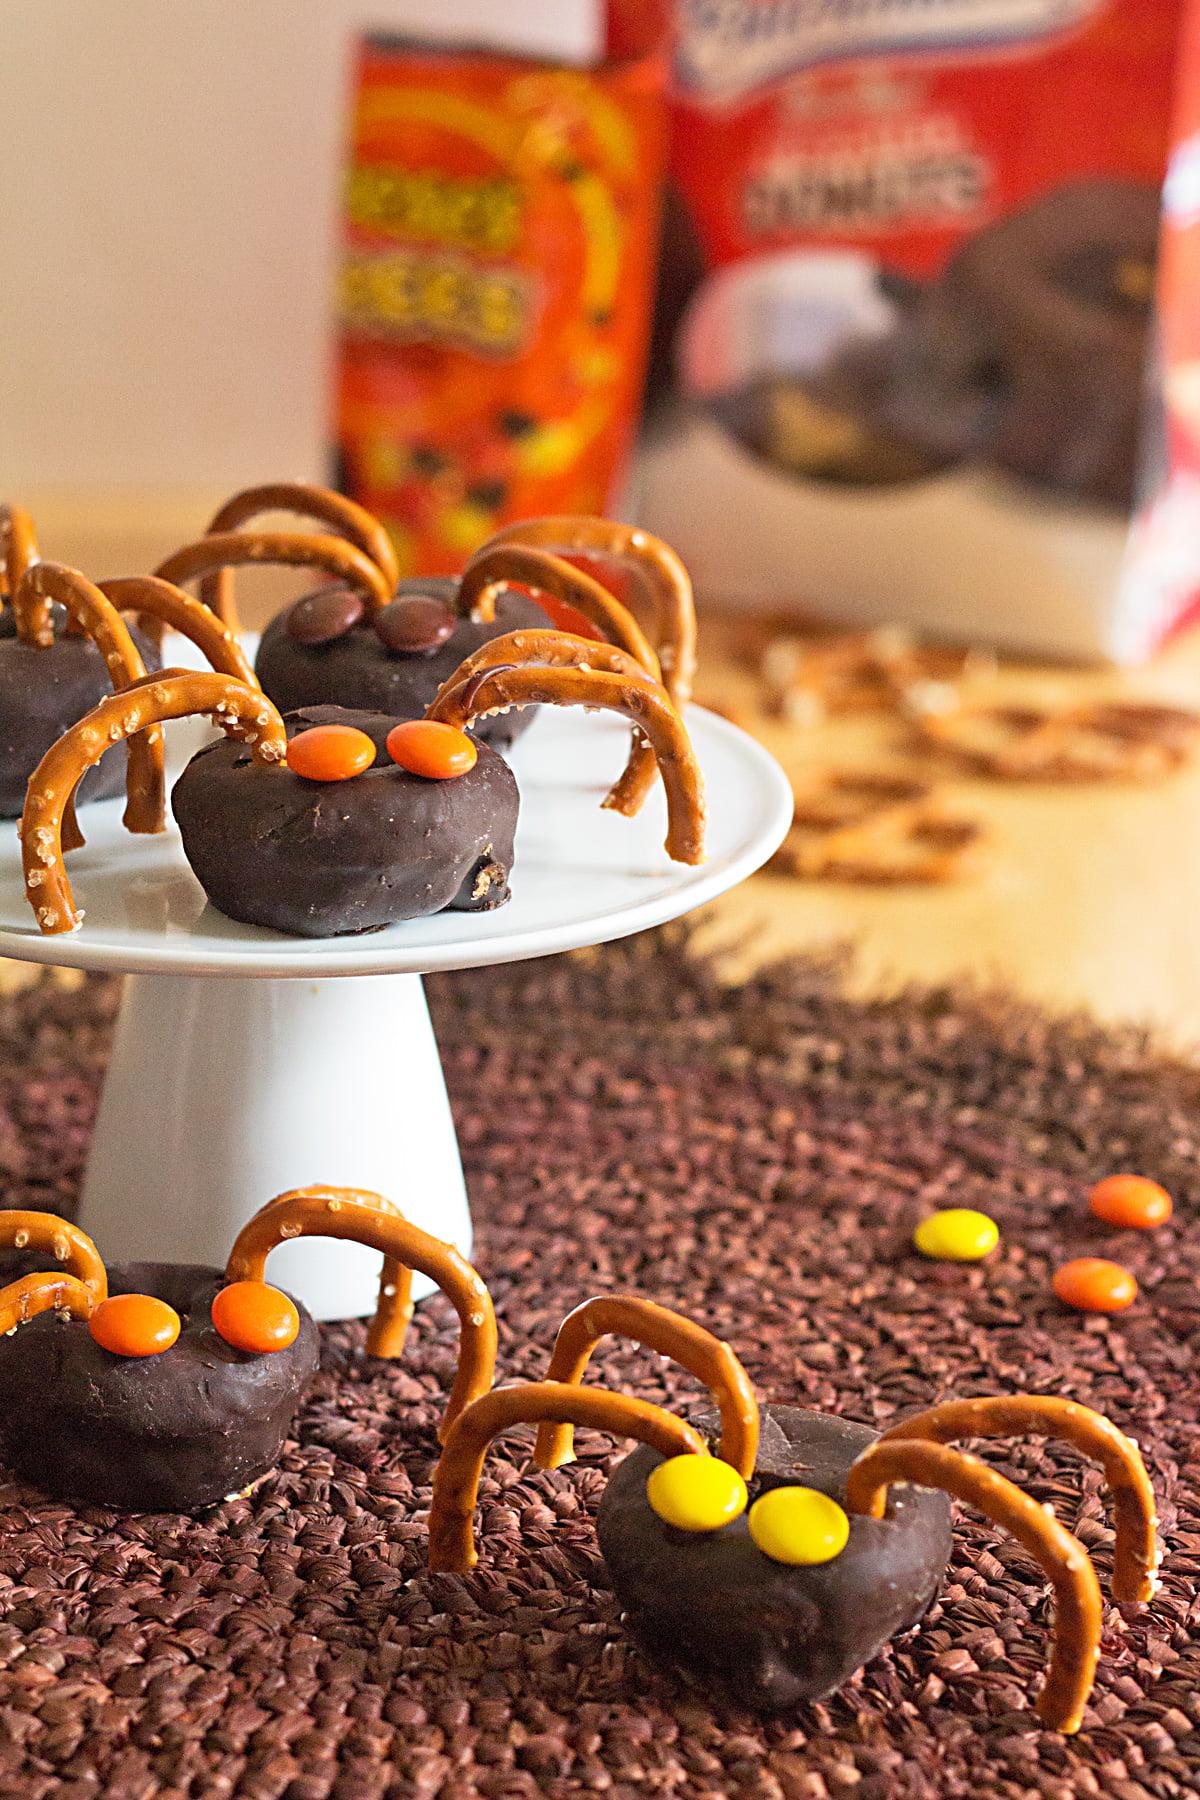 15 Fun Halloween Party Food Ideas for Kids ⋆ Its Yummi